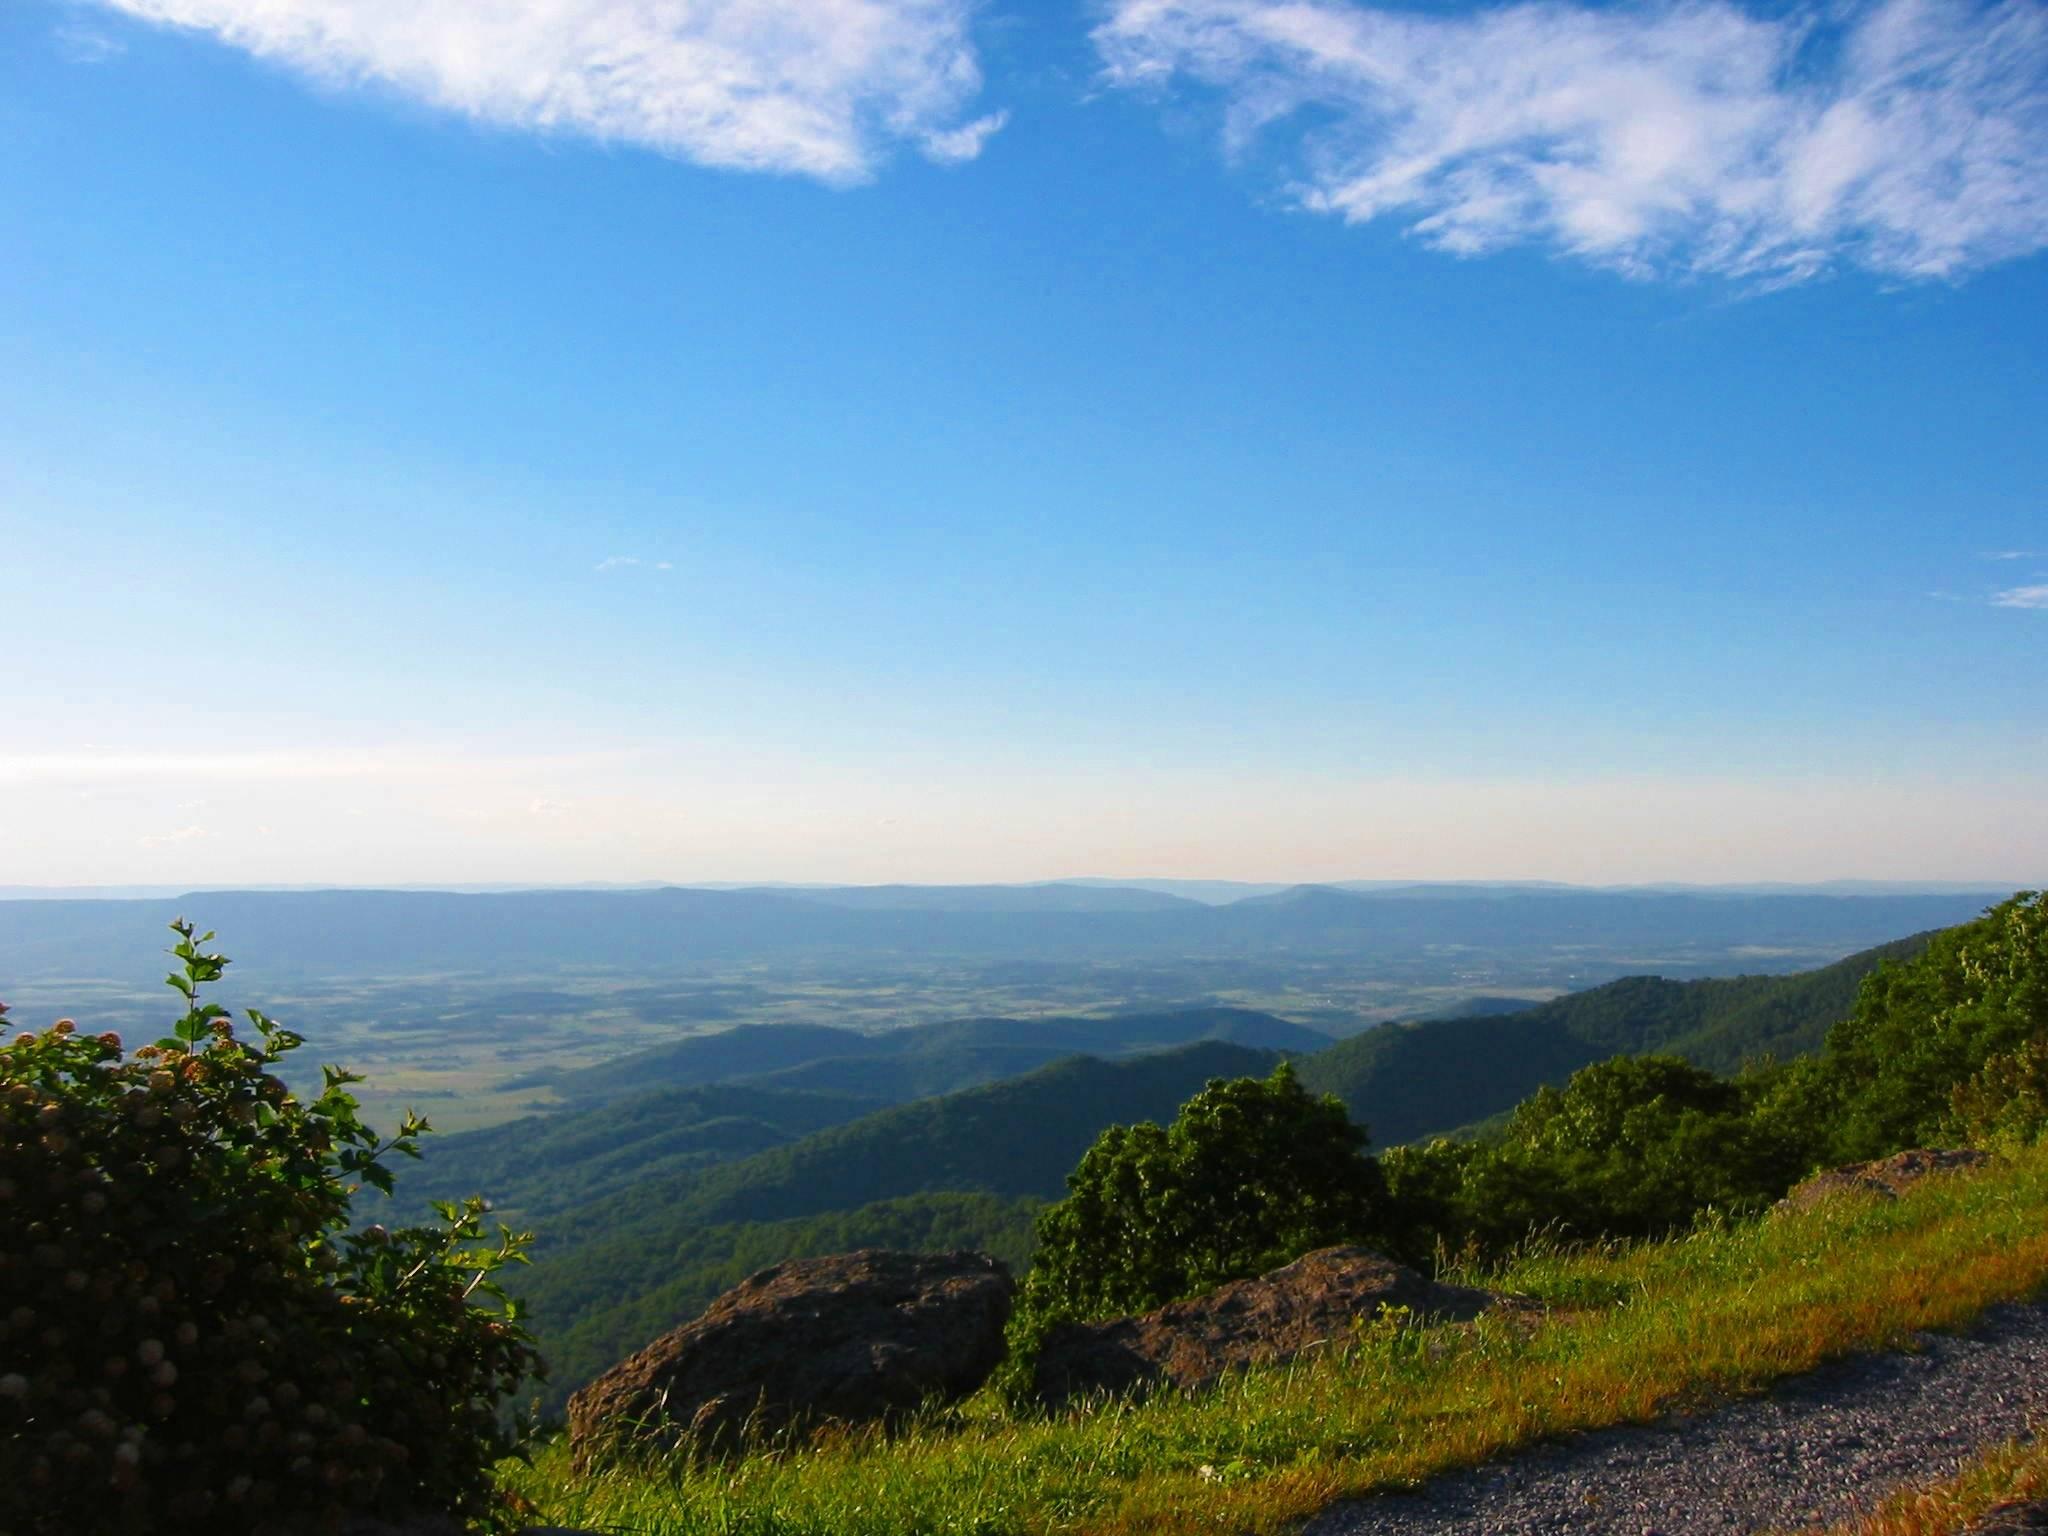 appalachian blue ridge mountains wallpaper - photo #13